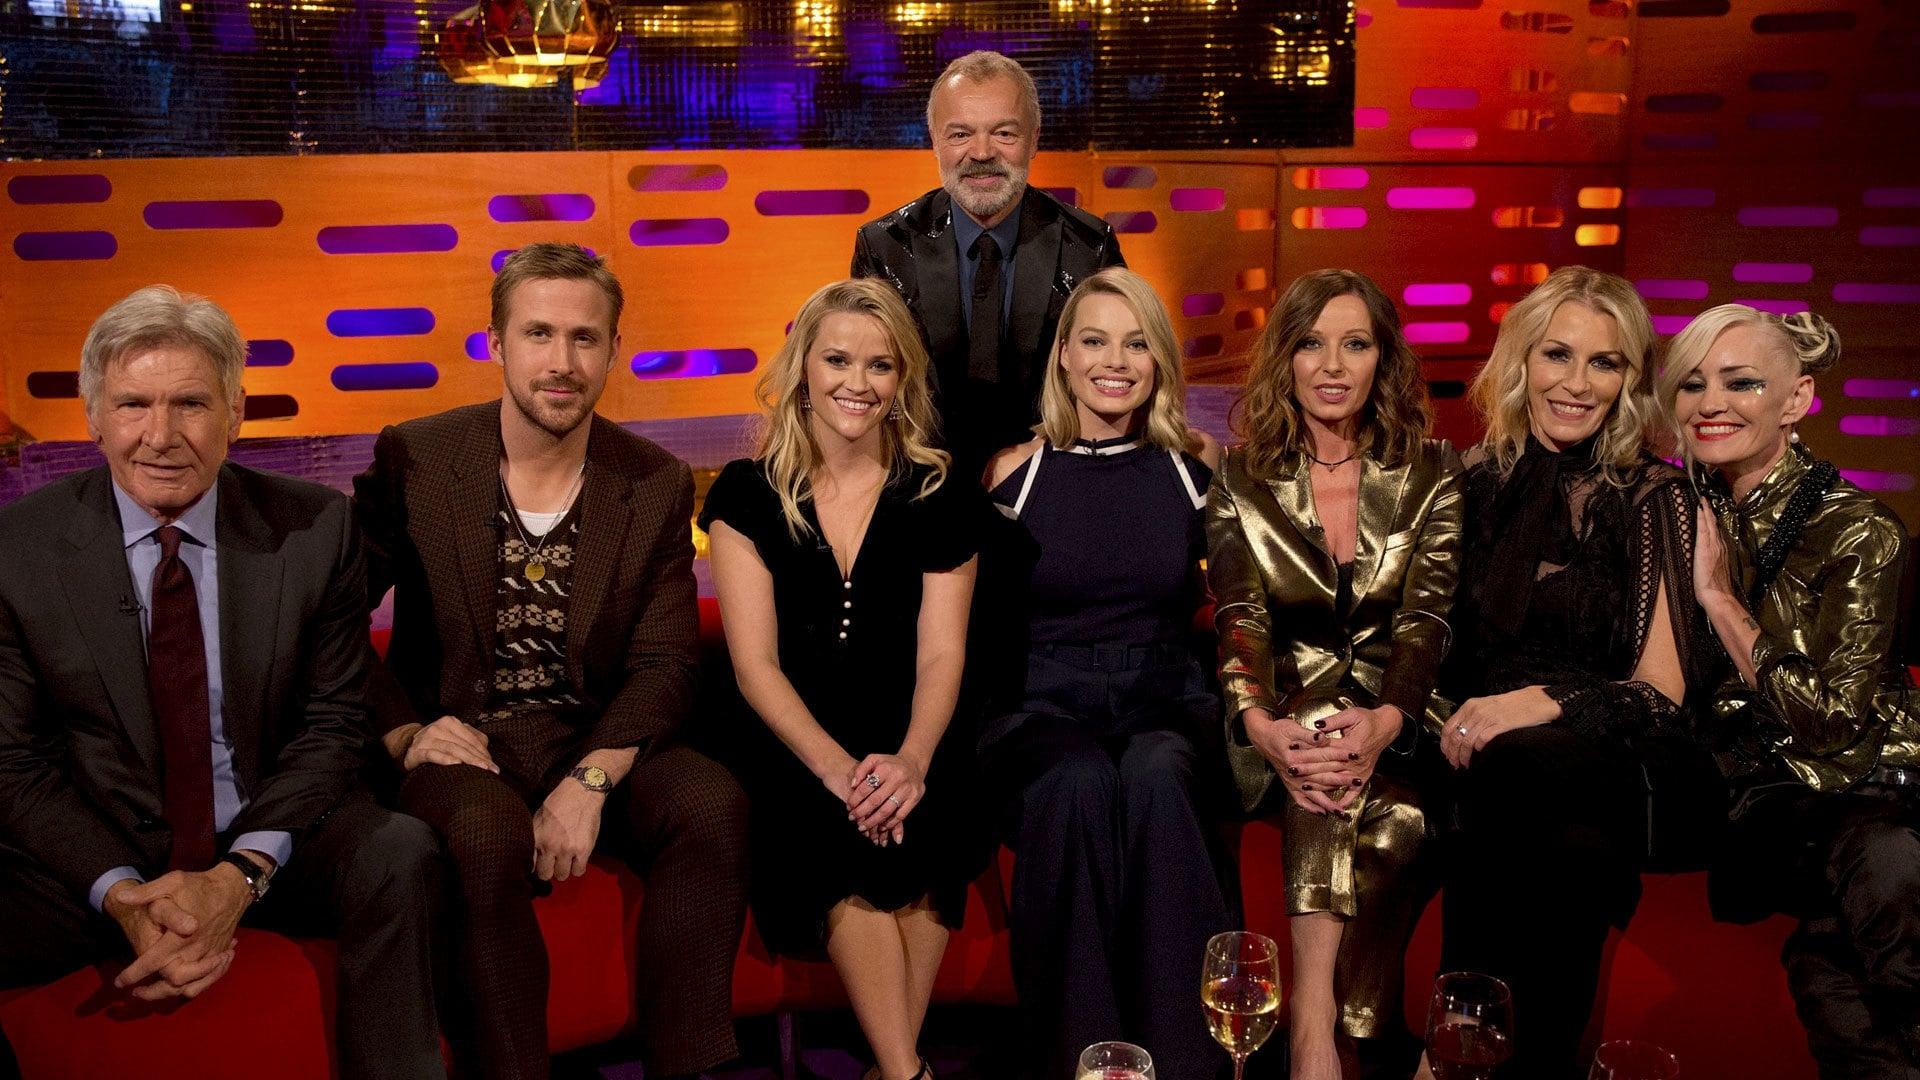 The Graham Norton Show Season 22 :Episode 1  Harrison Ford, Ryan Gosling, Margot Robbie, Reese Witherspoon, Bananarama